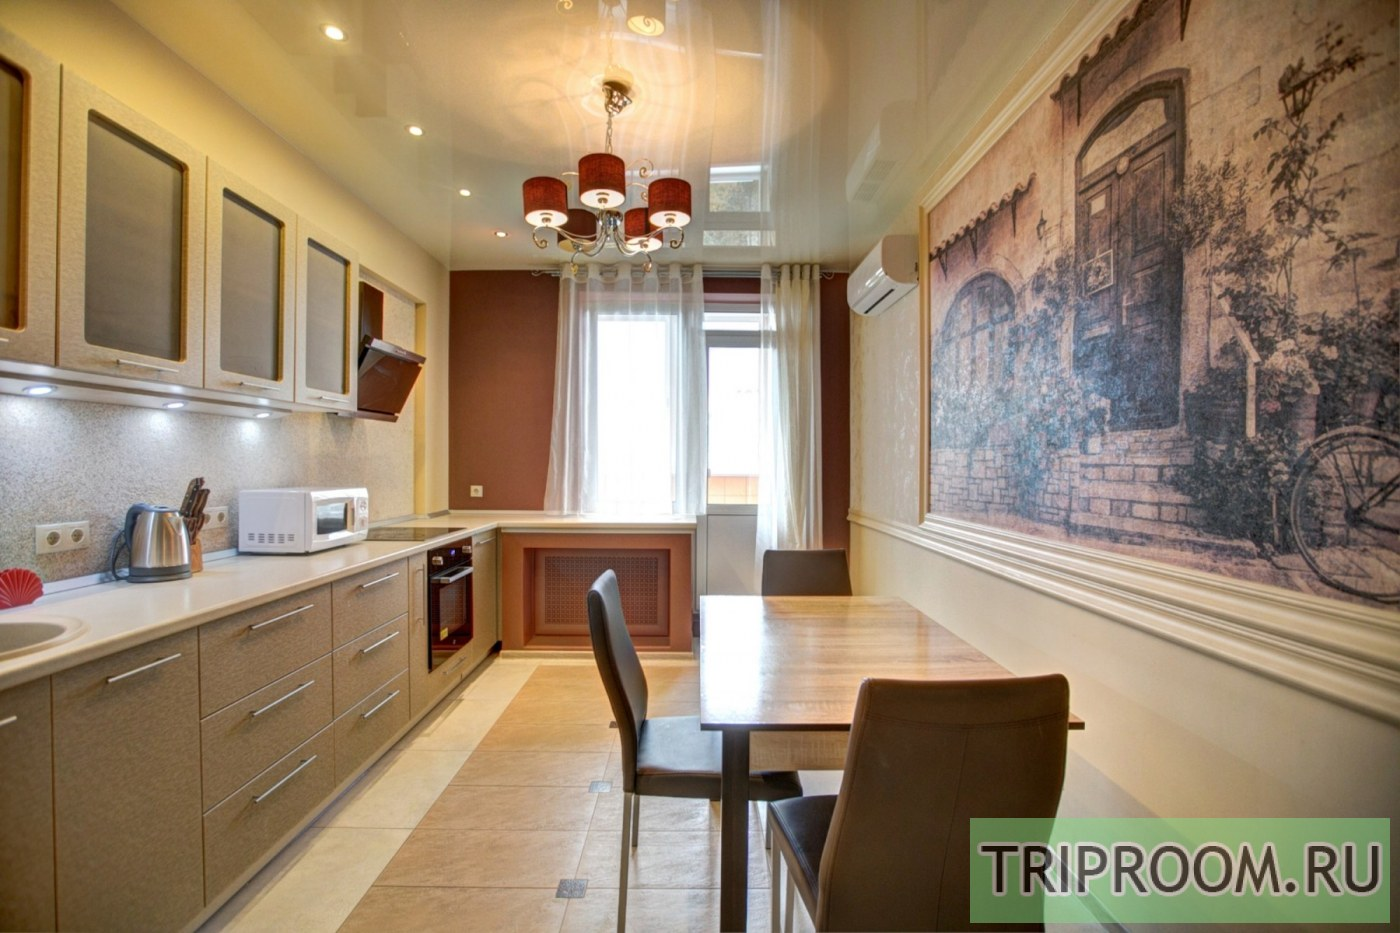 1-комнатная квартира посуточно (вариант № 38810), ул. Революции проспект, фото № 4